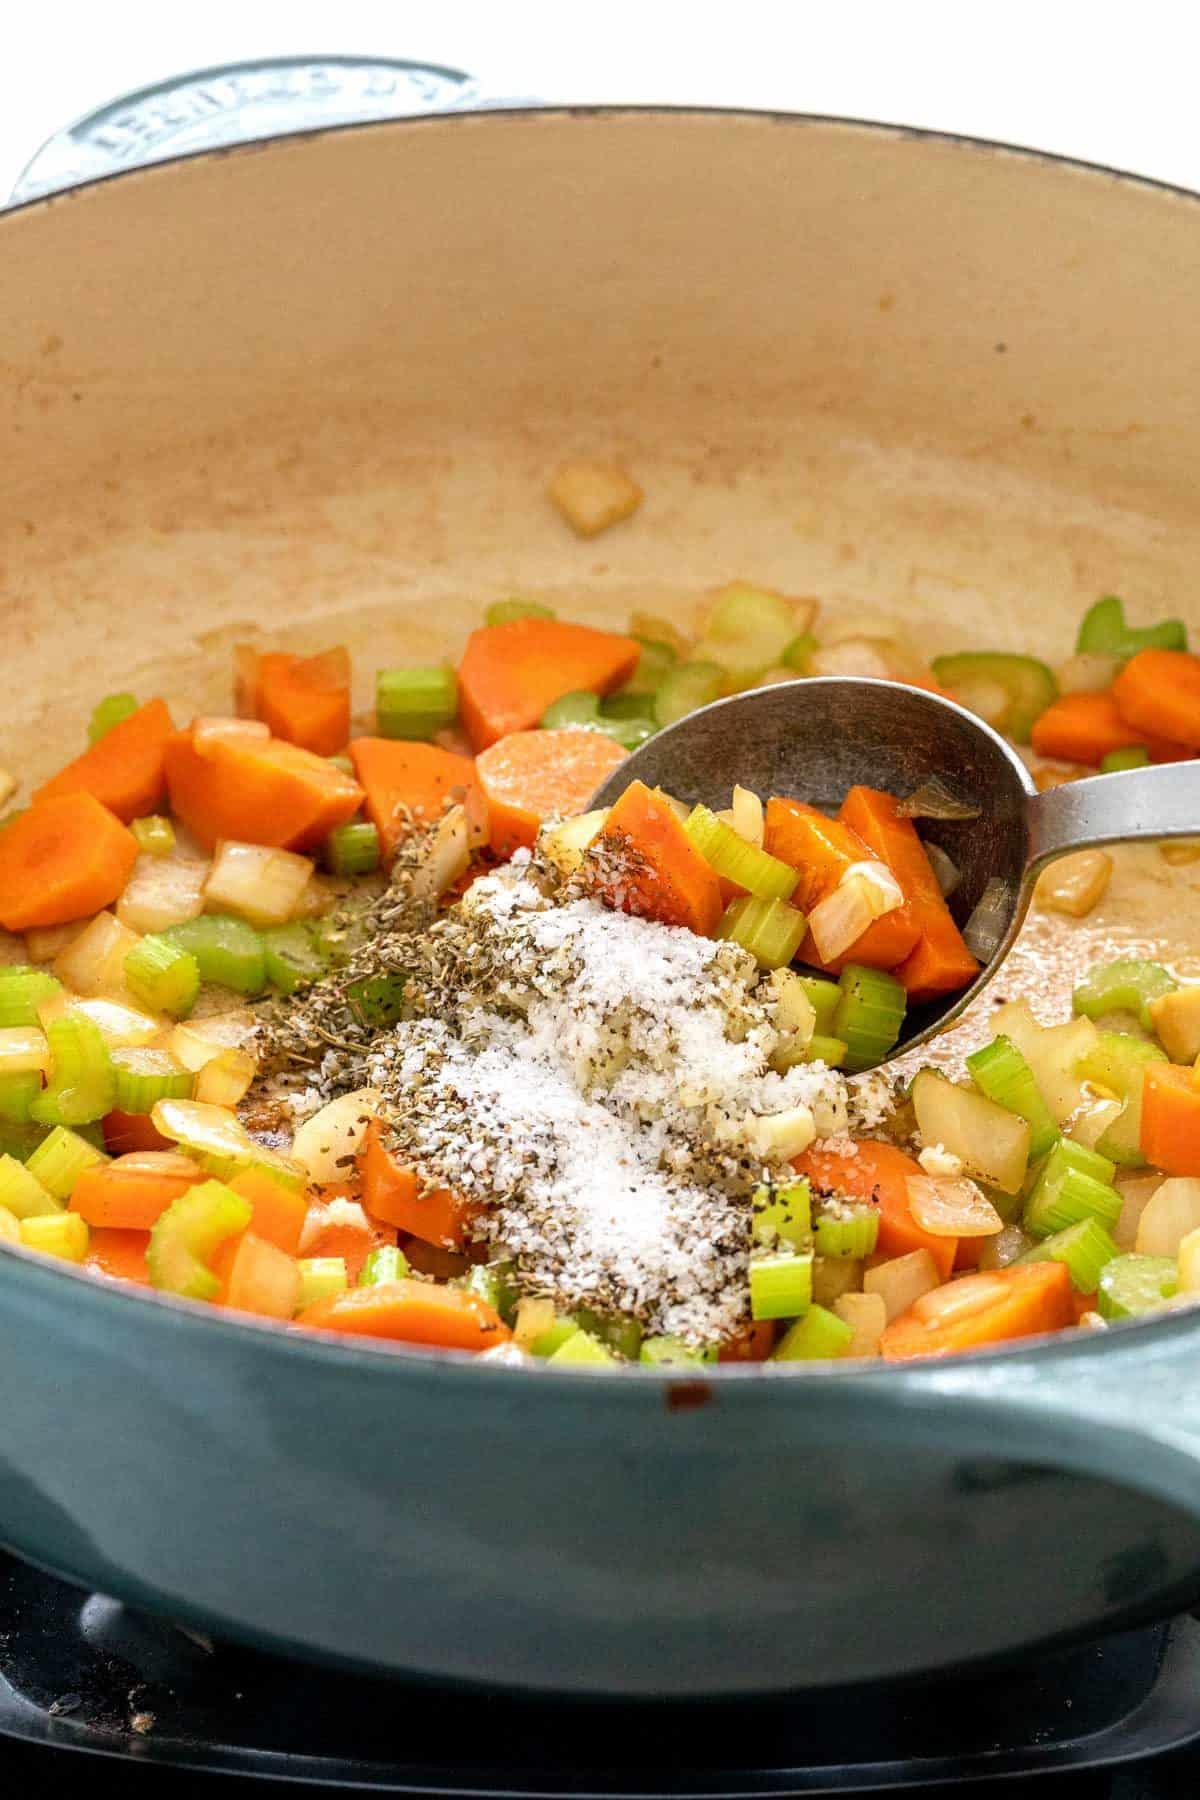 Chopped vegetables and seasonings in a pan